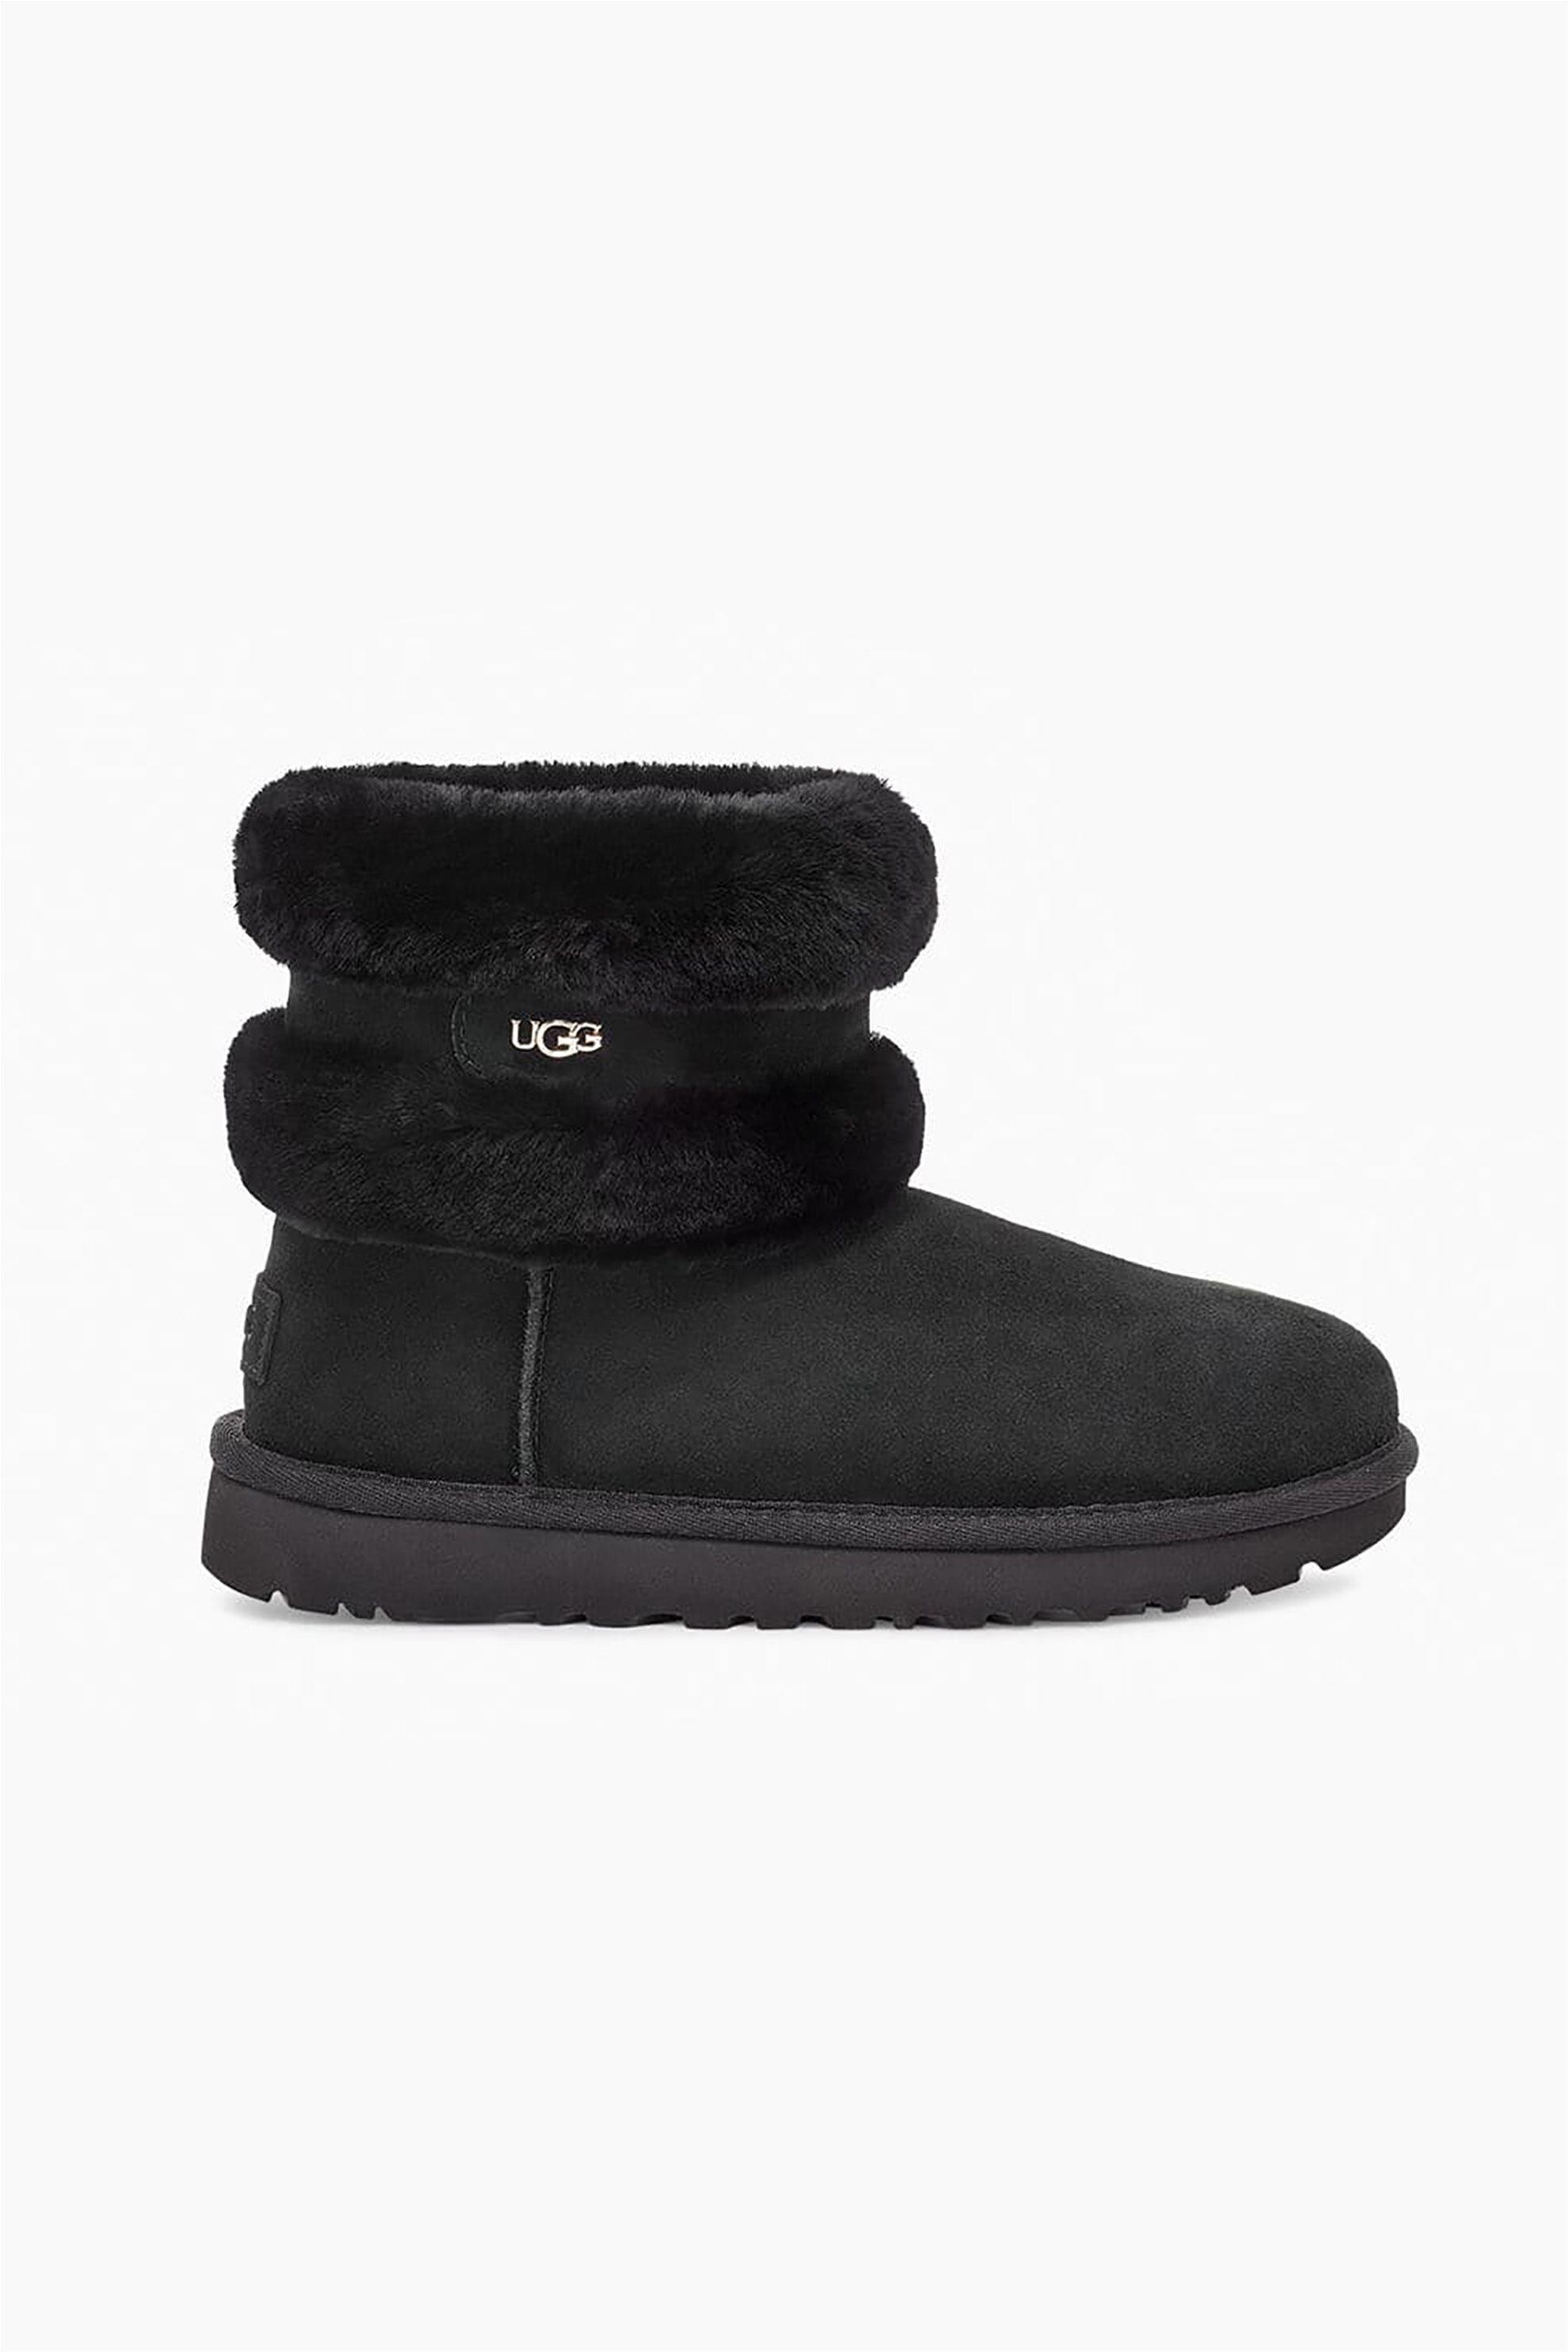 "Ugg γυναικεία μποτάκια με γούνα και μεταλλικό λογότυπο ""Fluff Mini Belted"" – 1112483 – Μαύρο"